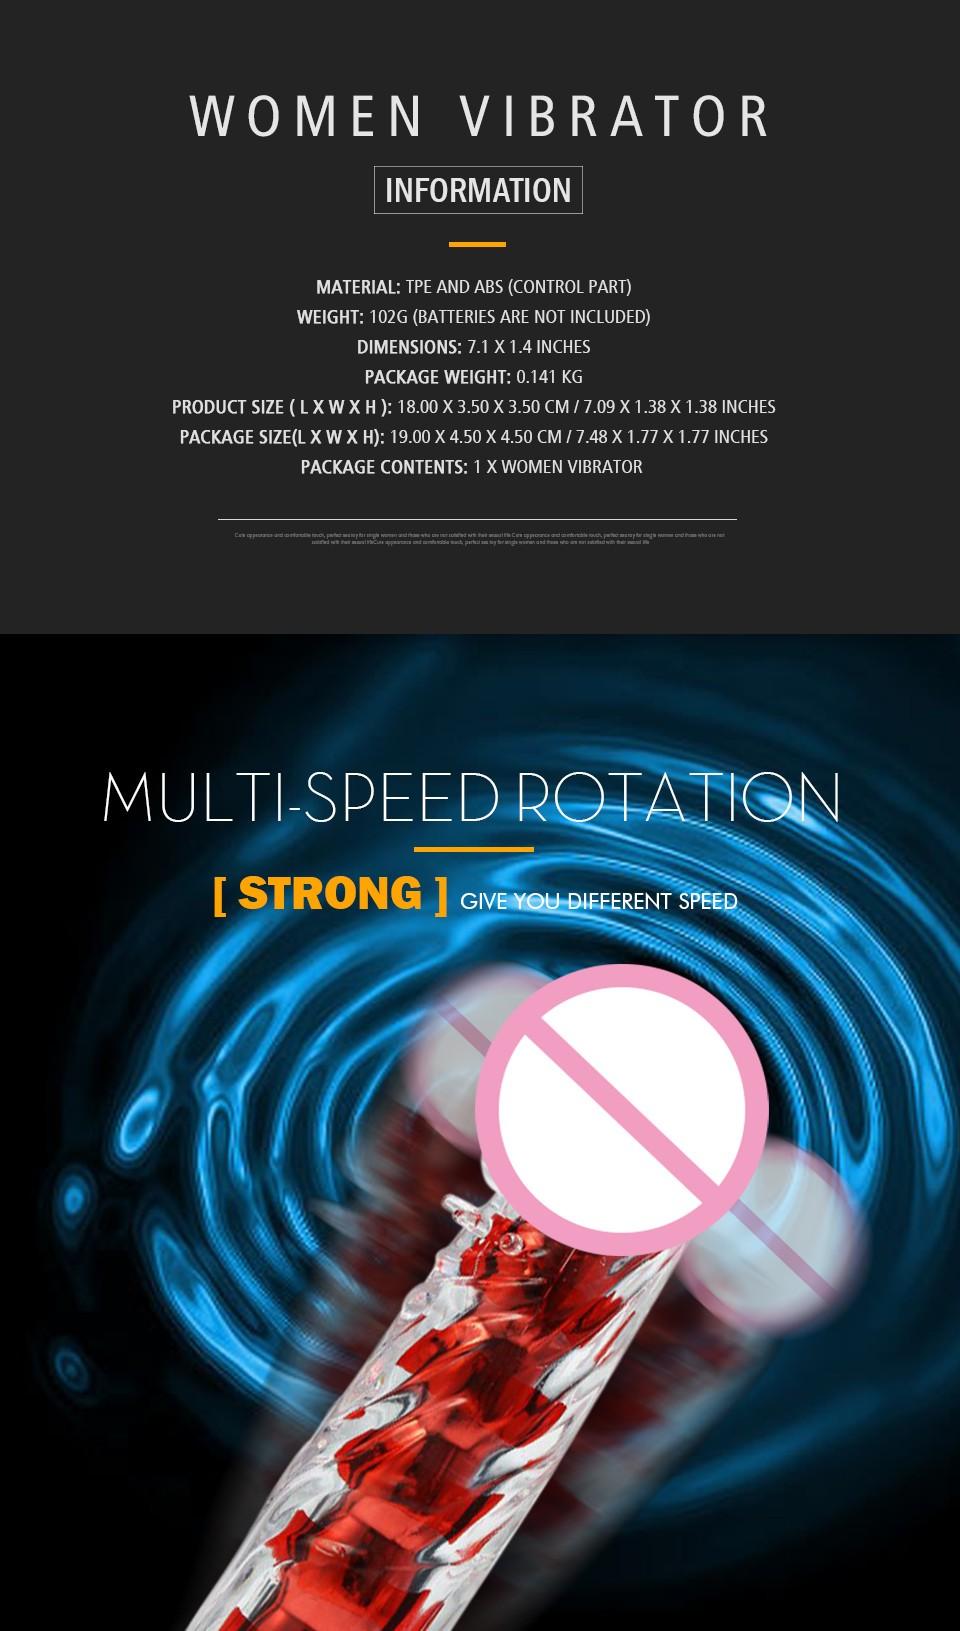 HTB1avm2KFXXXXXVaXXXq6xXFXXXl - Multi Speed Silicone G Spot Classic Vibrator 7 Inches Sex Toy